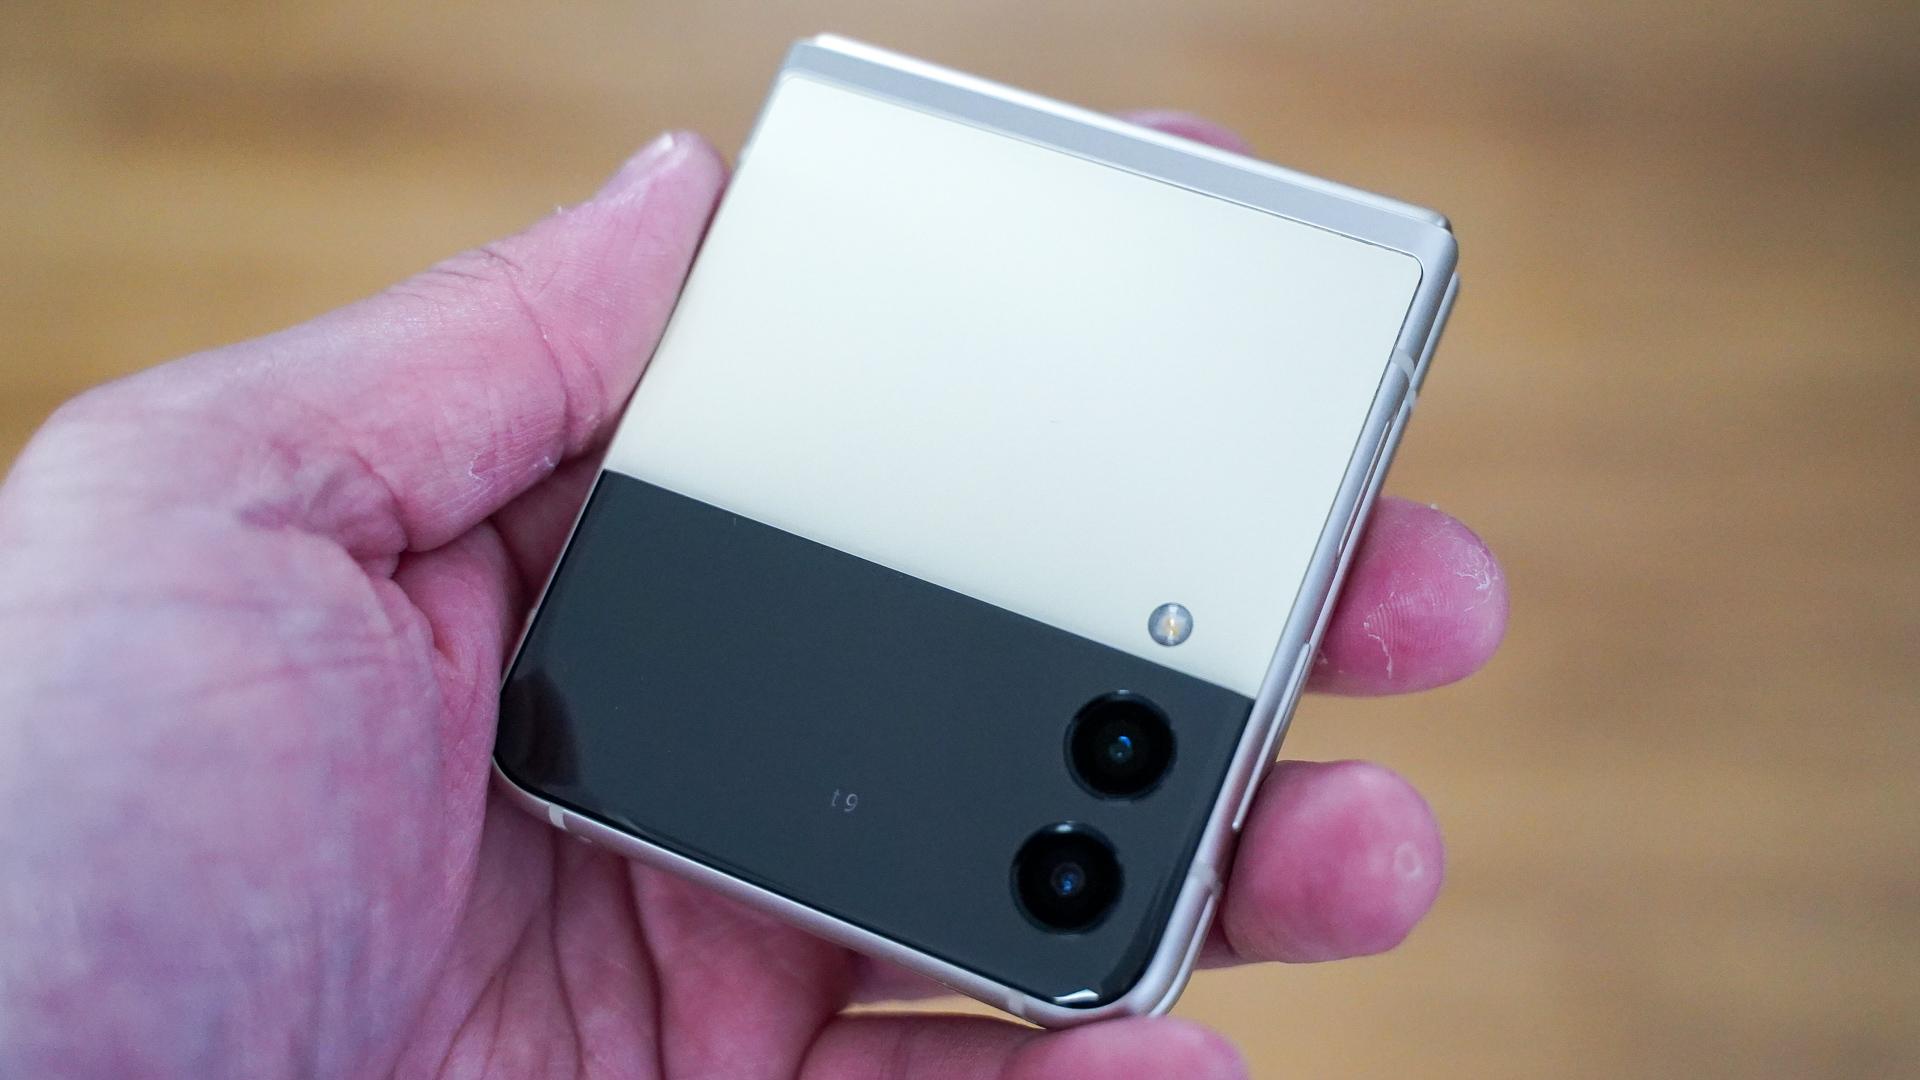 Samsung Galaxy Flip 3 closed front profile